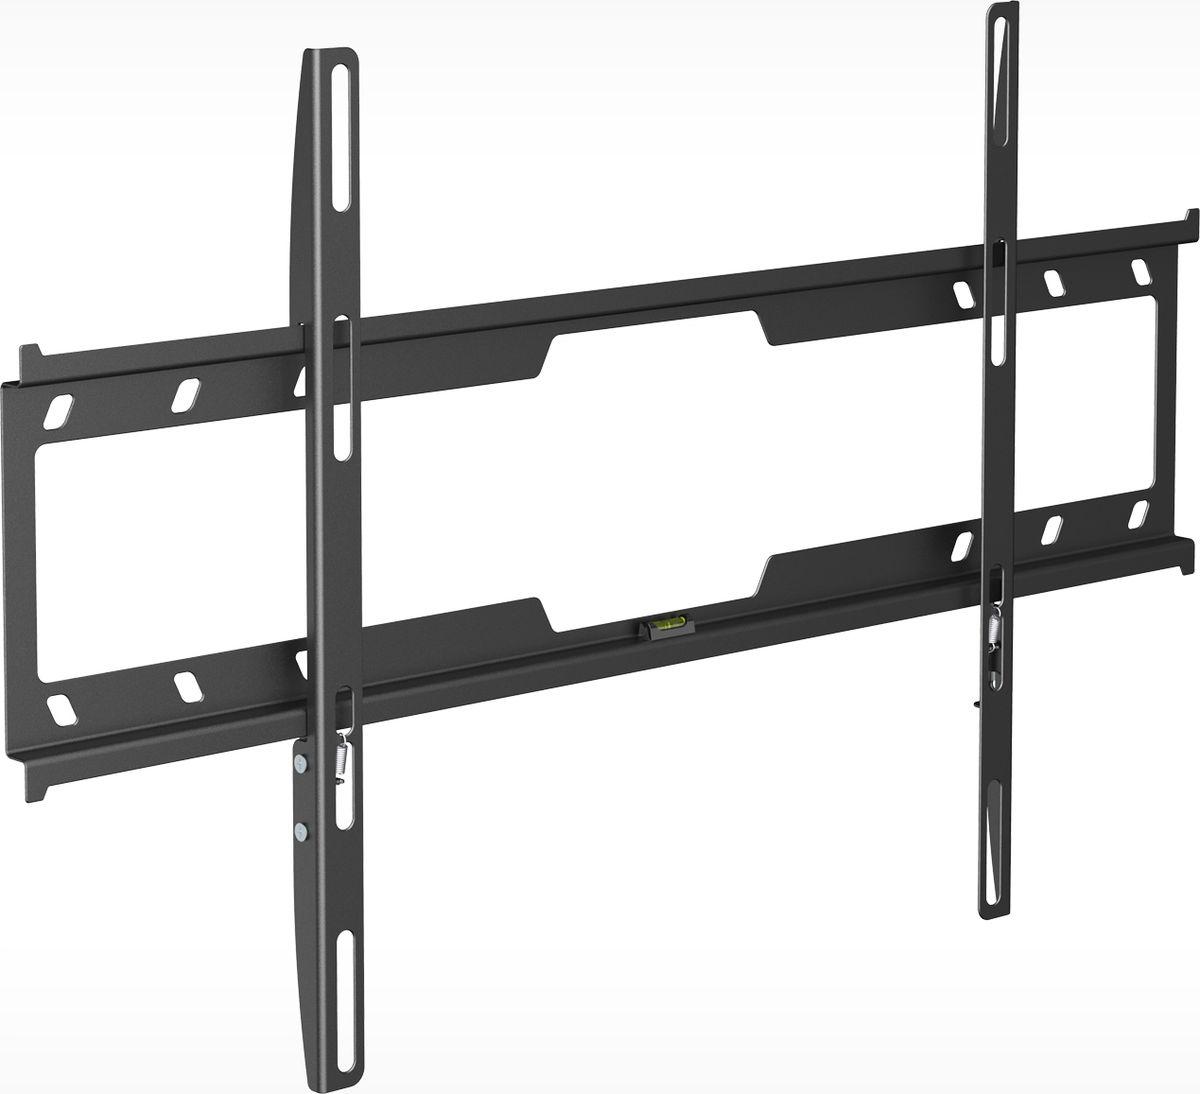 Holder LCD-F6618-B, Black кронштейн для ТВ цена